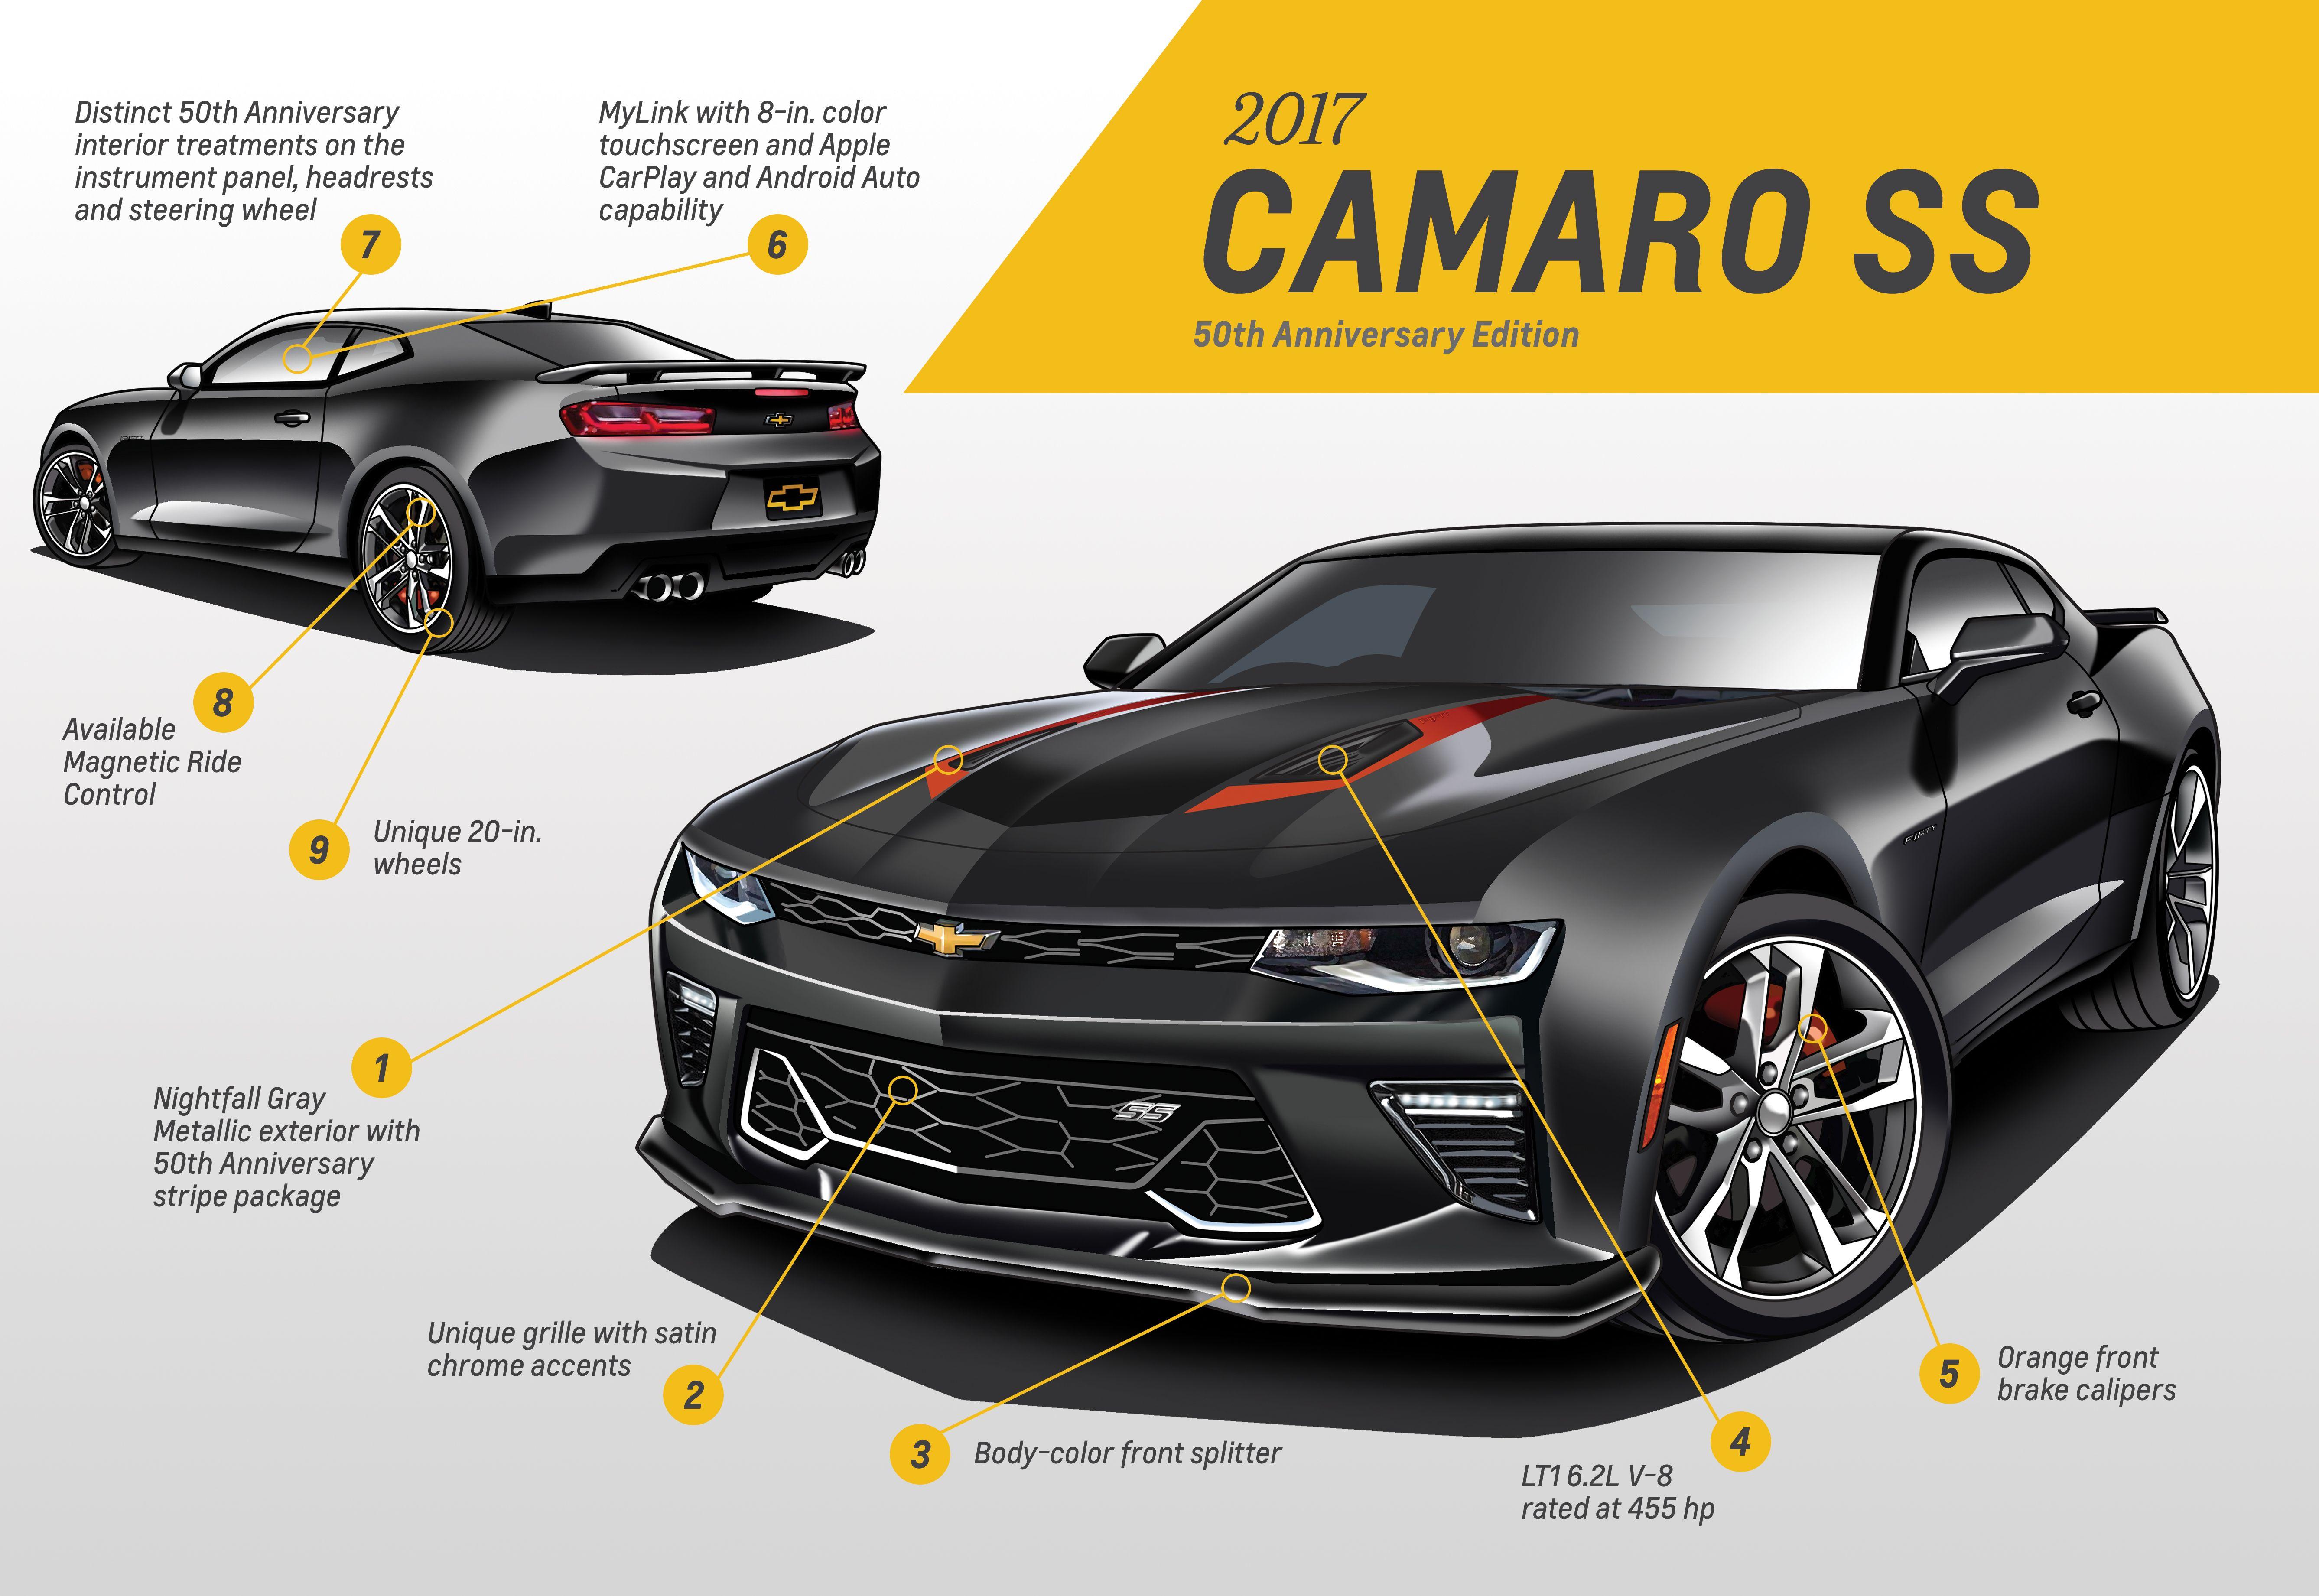 2017 Chevrolet Camaro SS Camaros Pinterest